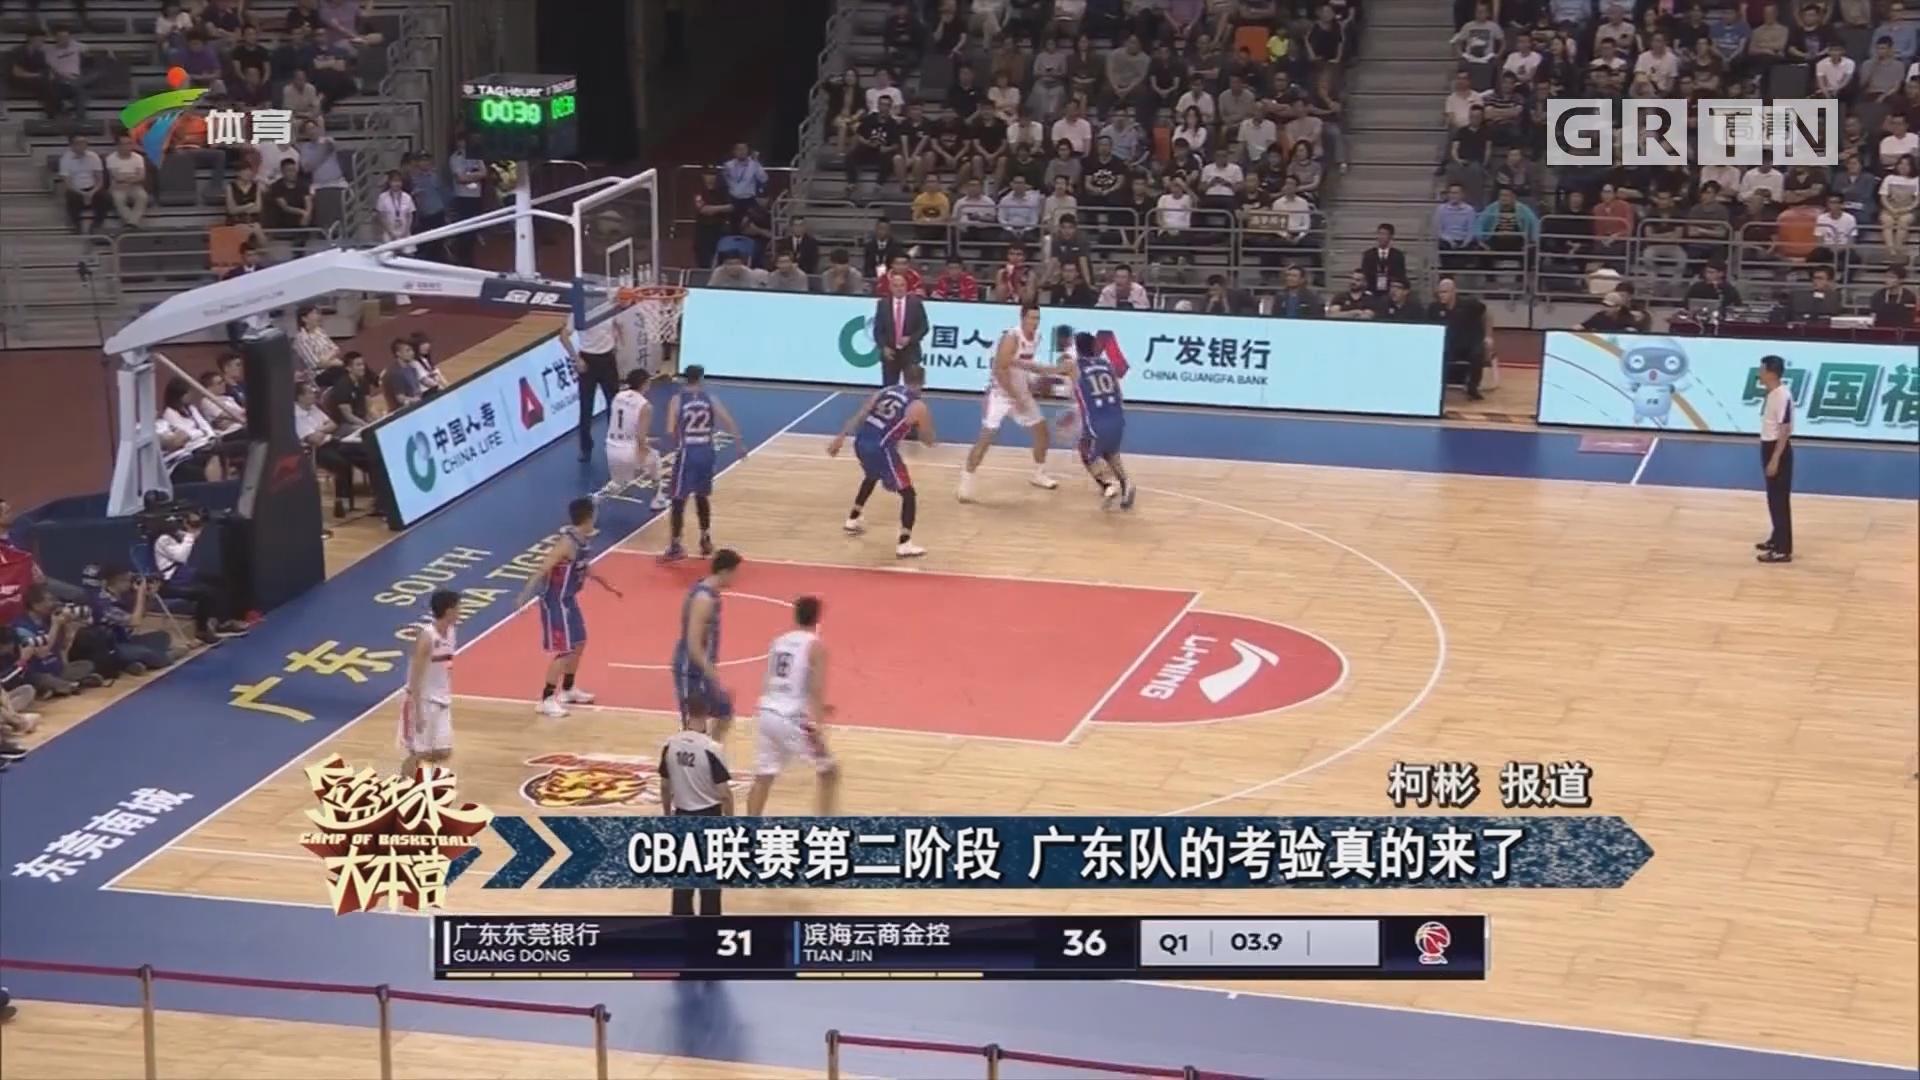 CBA联赛第二阶段 广东队的考验真的来了